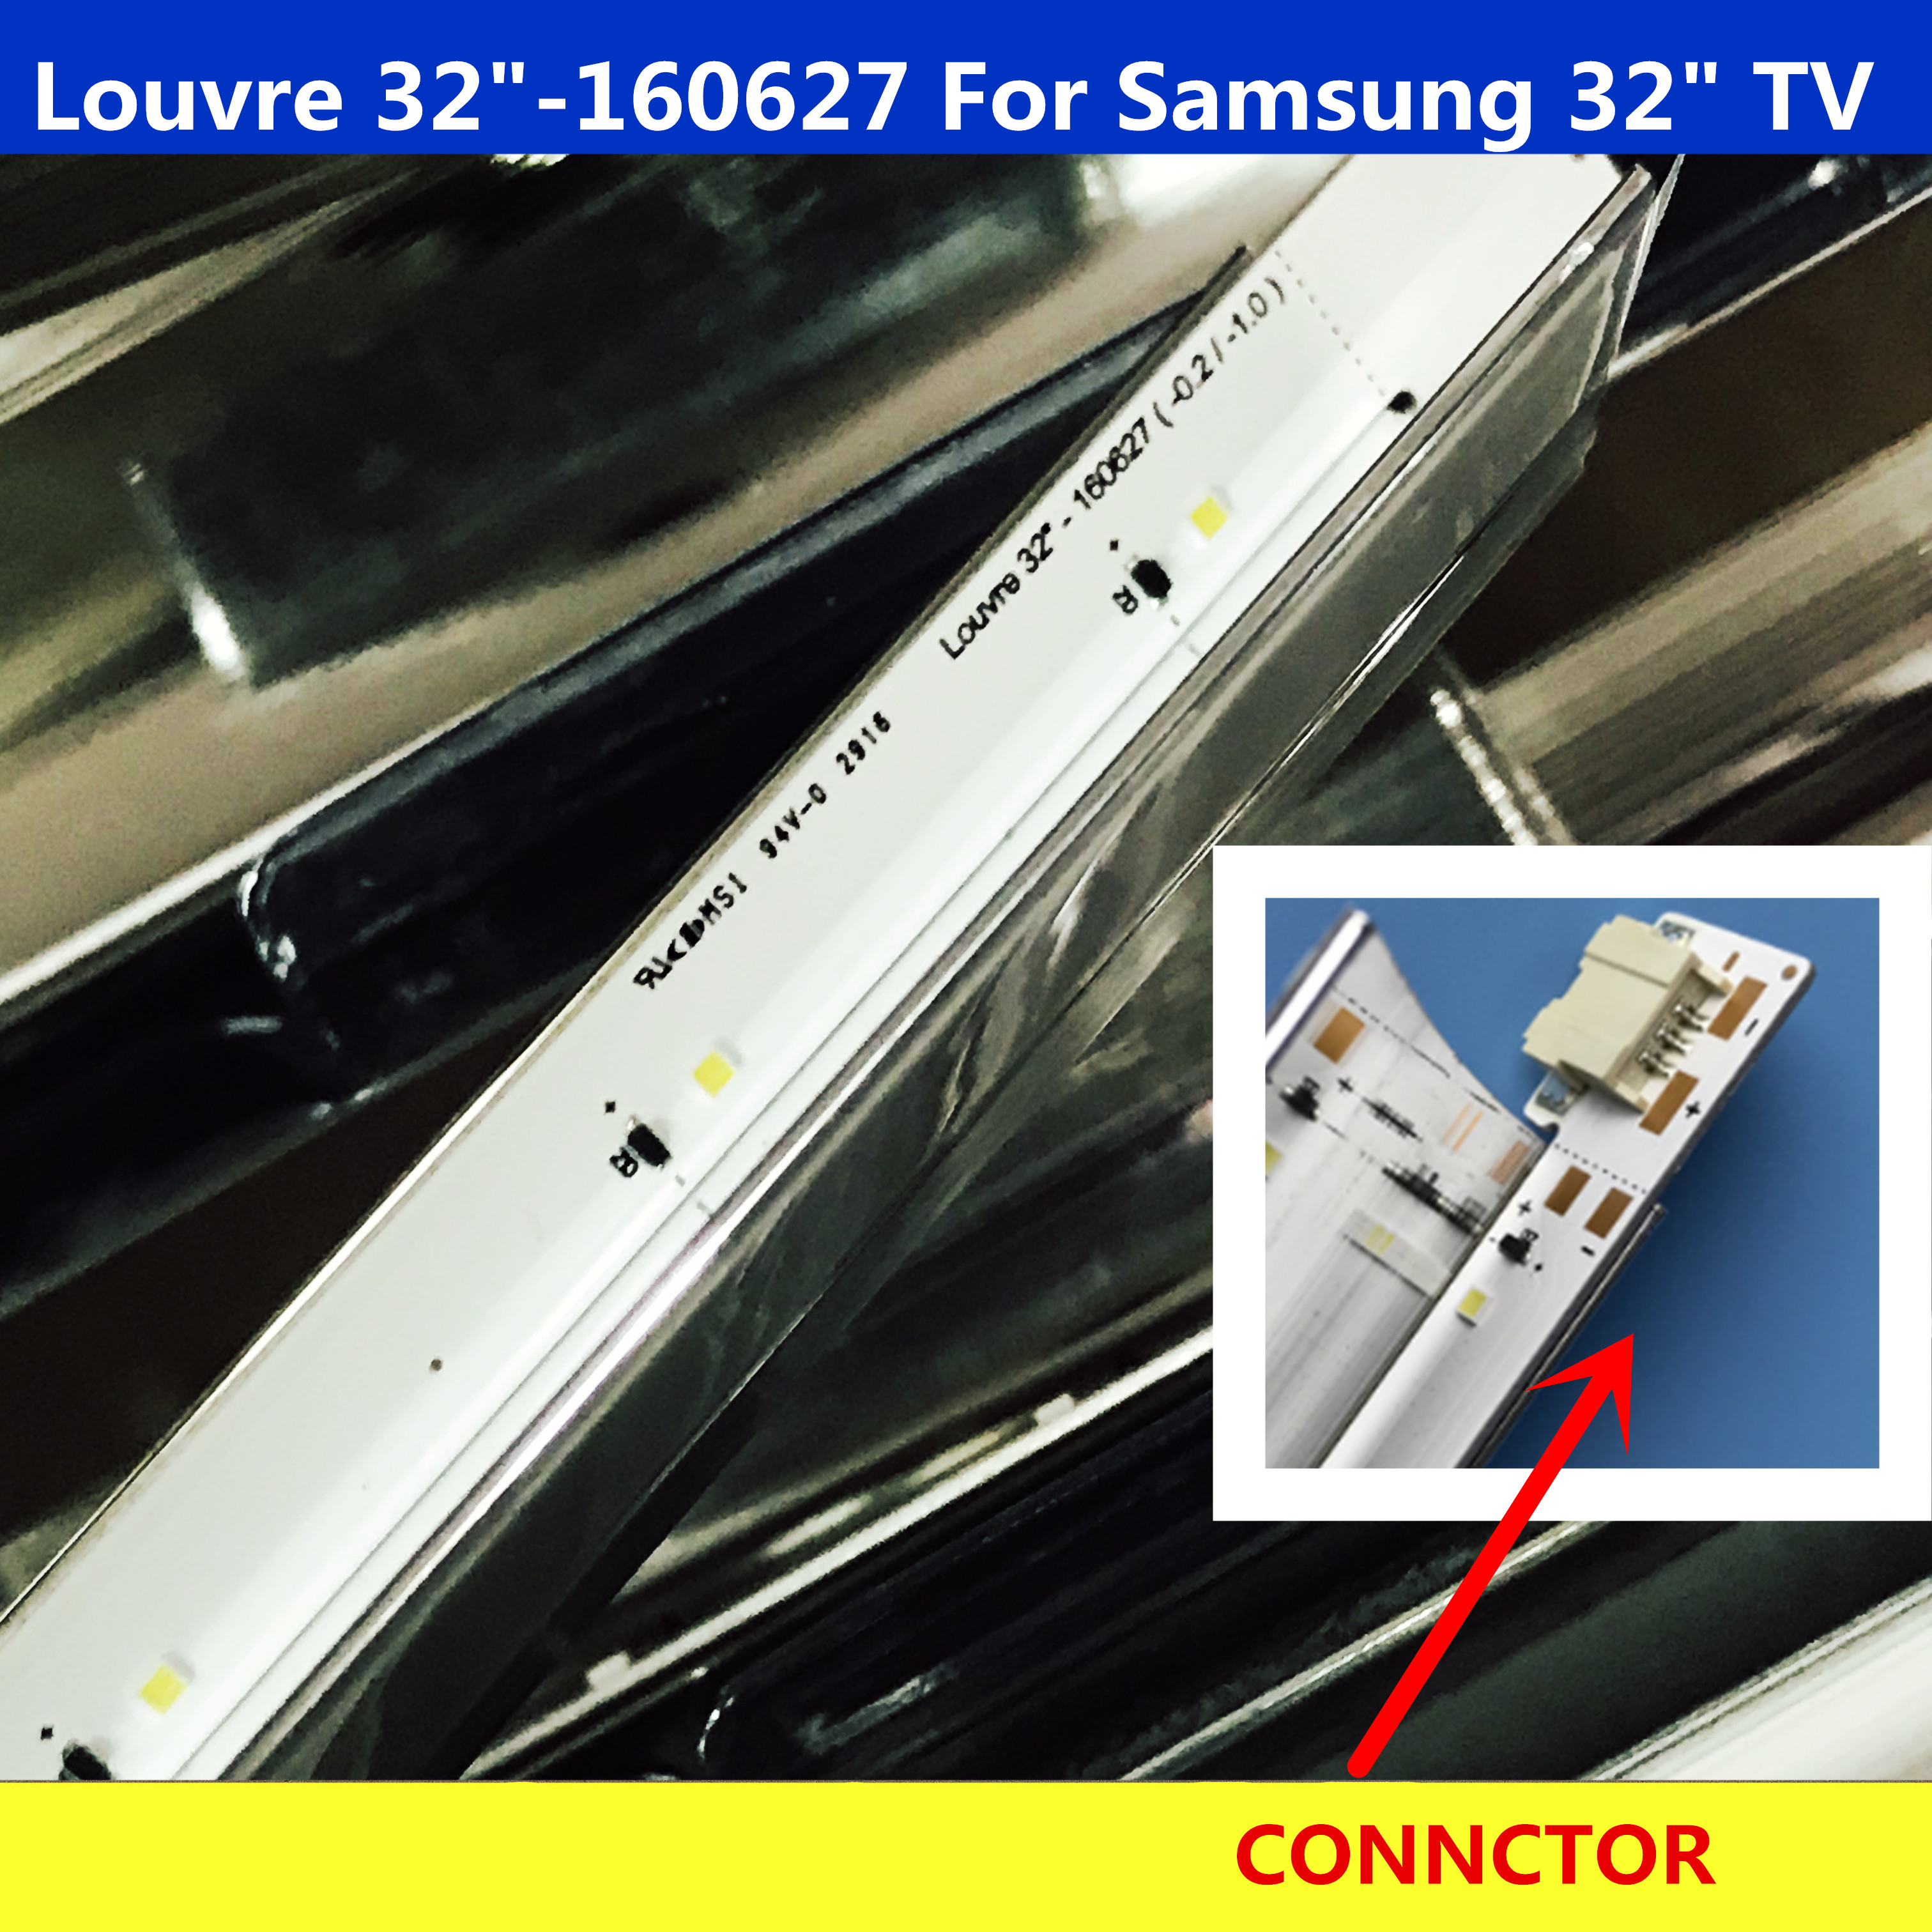 "2PCS LED Backlight strip For Samsung UE32K4109AK Louvre 32""-160627 UE32K4100AK Un32k4100ag Ue32k5100 T32E319EI-EN LT32E319"